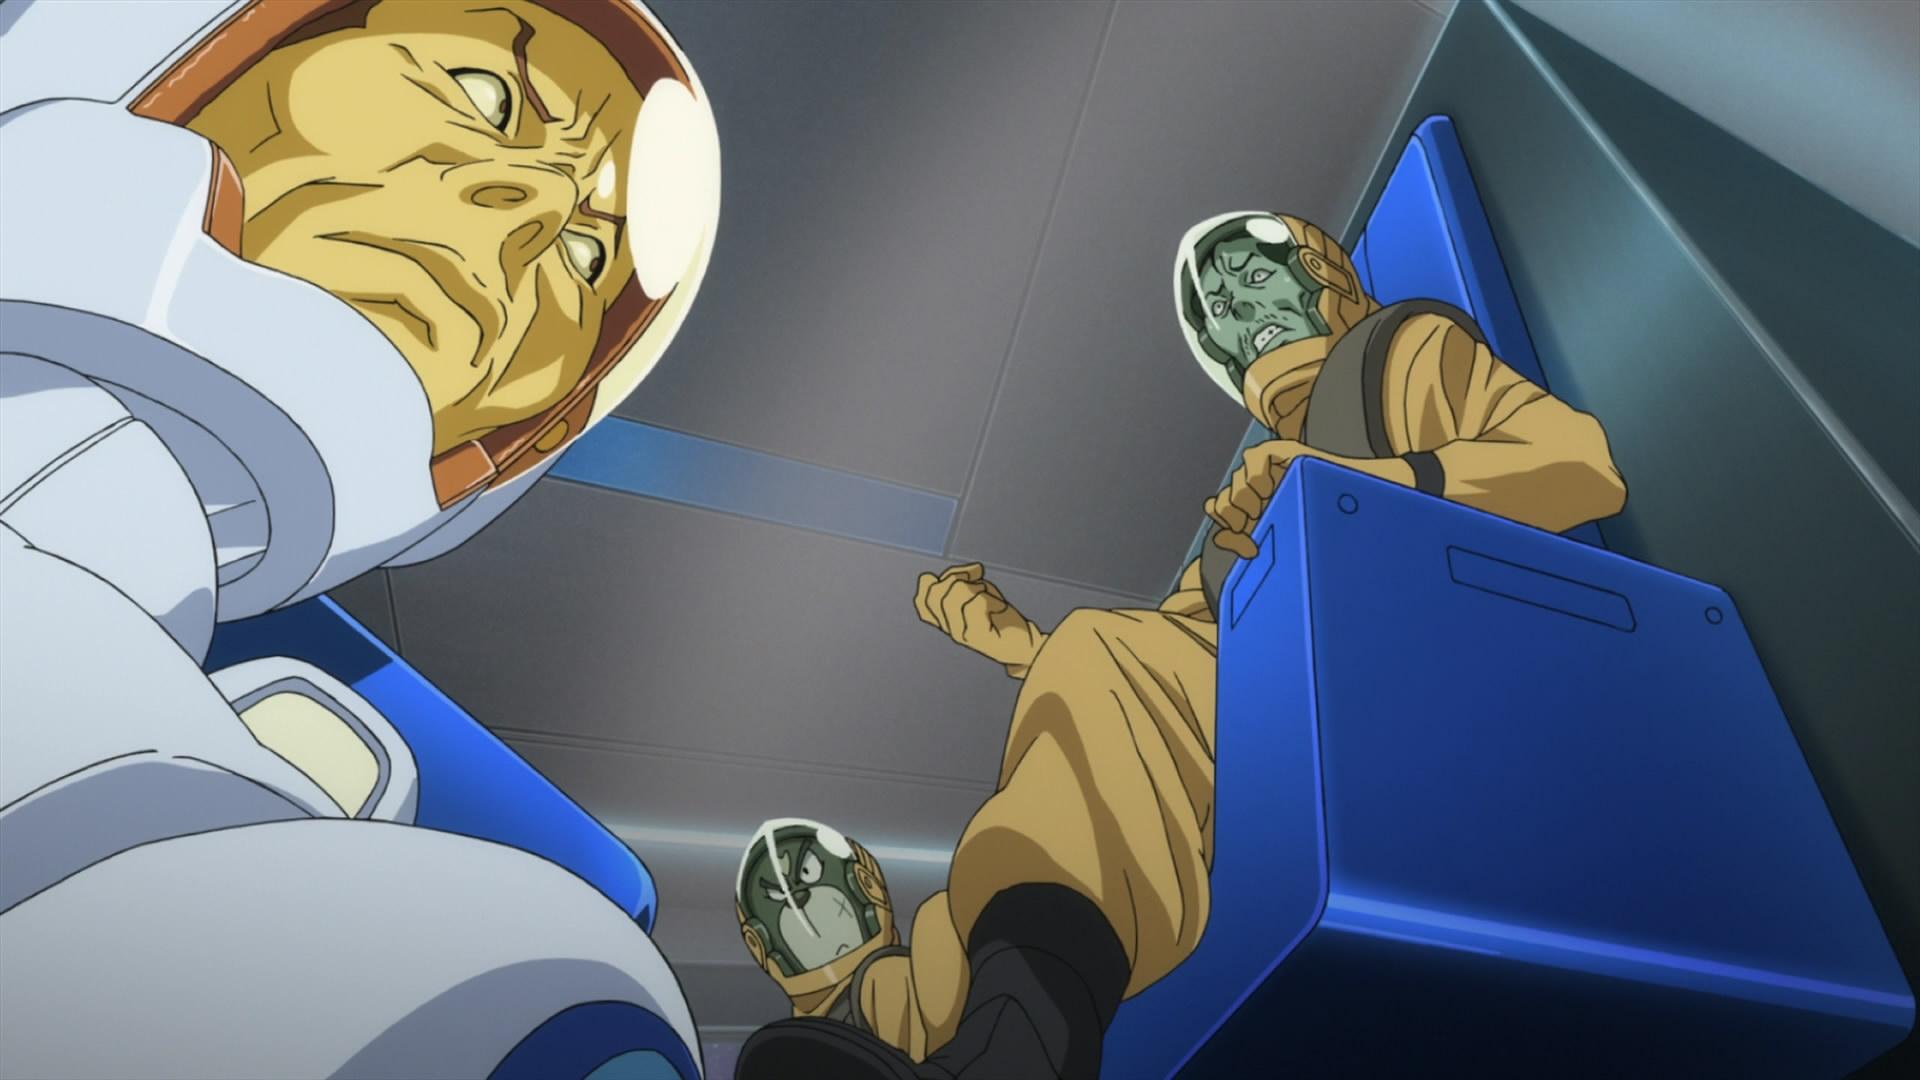 [gSS]_Mobile_Suit_Gundam_00_-_A_wakening_of_the_Trailblazer_(1080p)_[2B252856].mkv_snapshot_00.04.56_[2011.01.07_04.00.31]